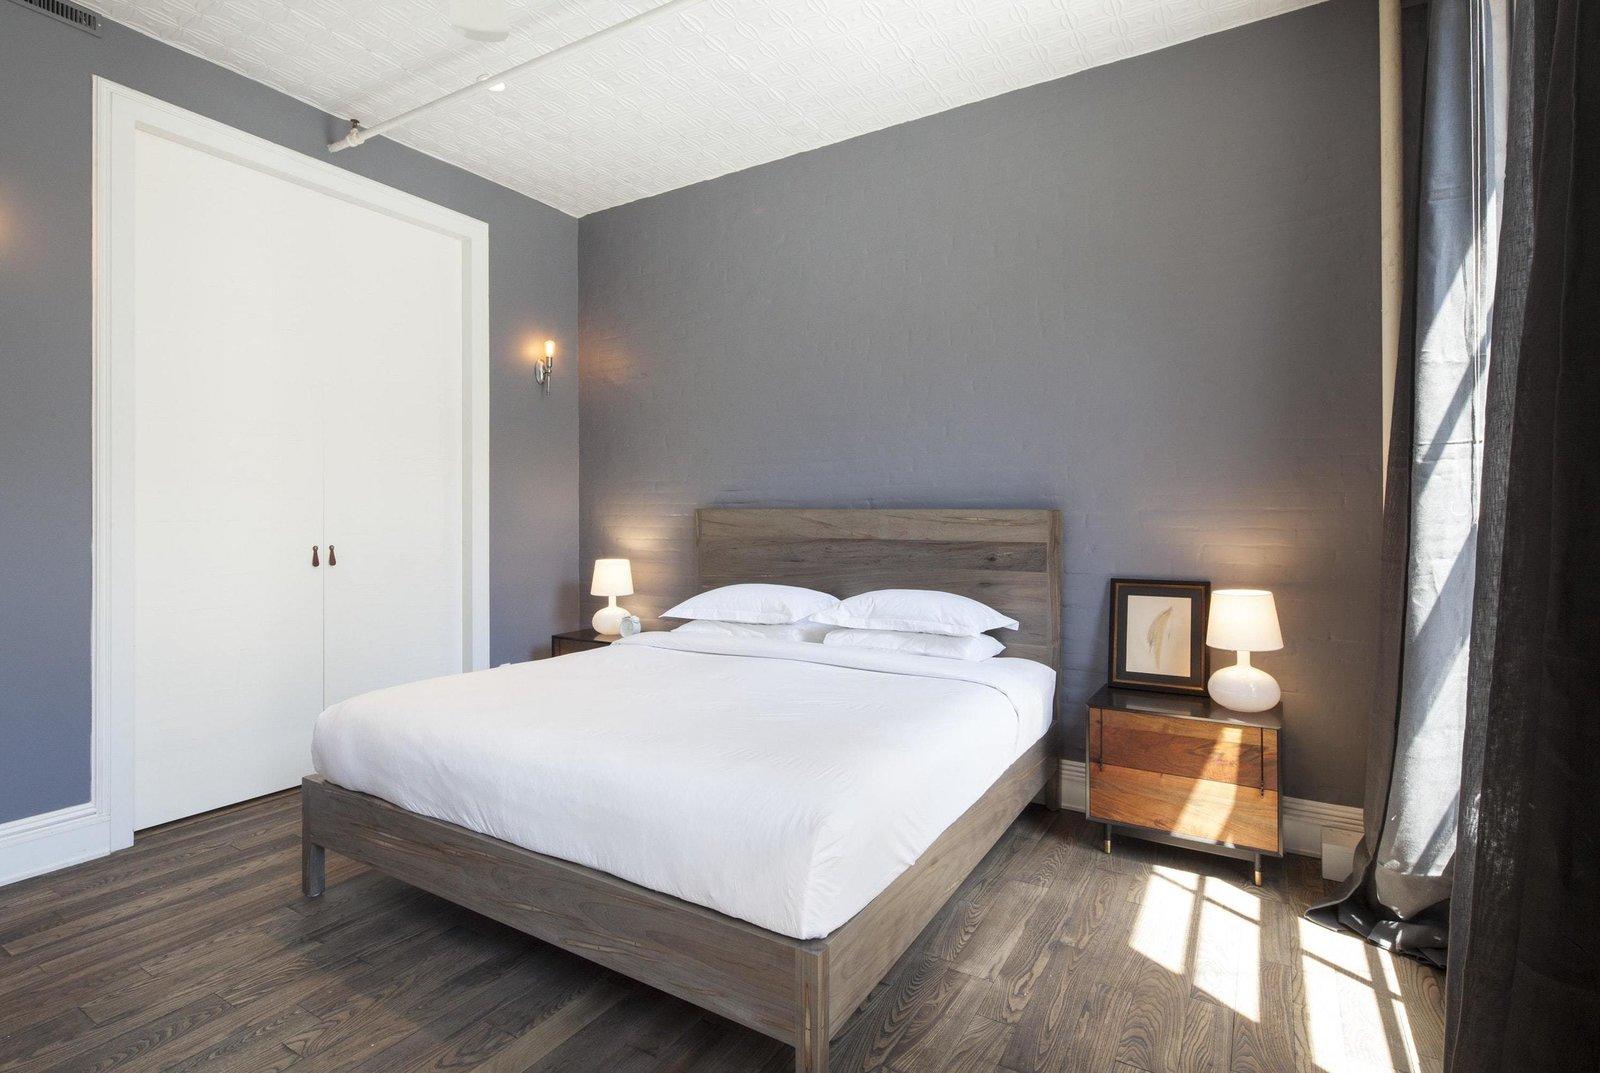 Bedroom, Night Stands, Wall Lighting, Bed, Table Lighting, Medium Hardwood Floor, and Storage  Prince Street